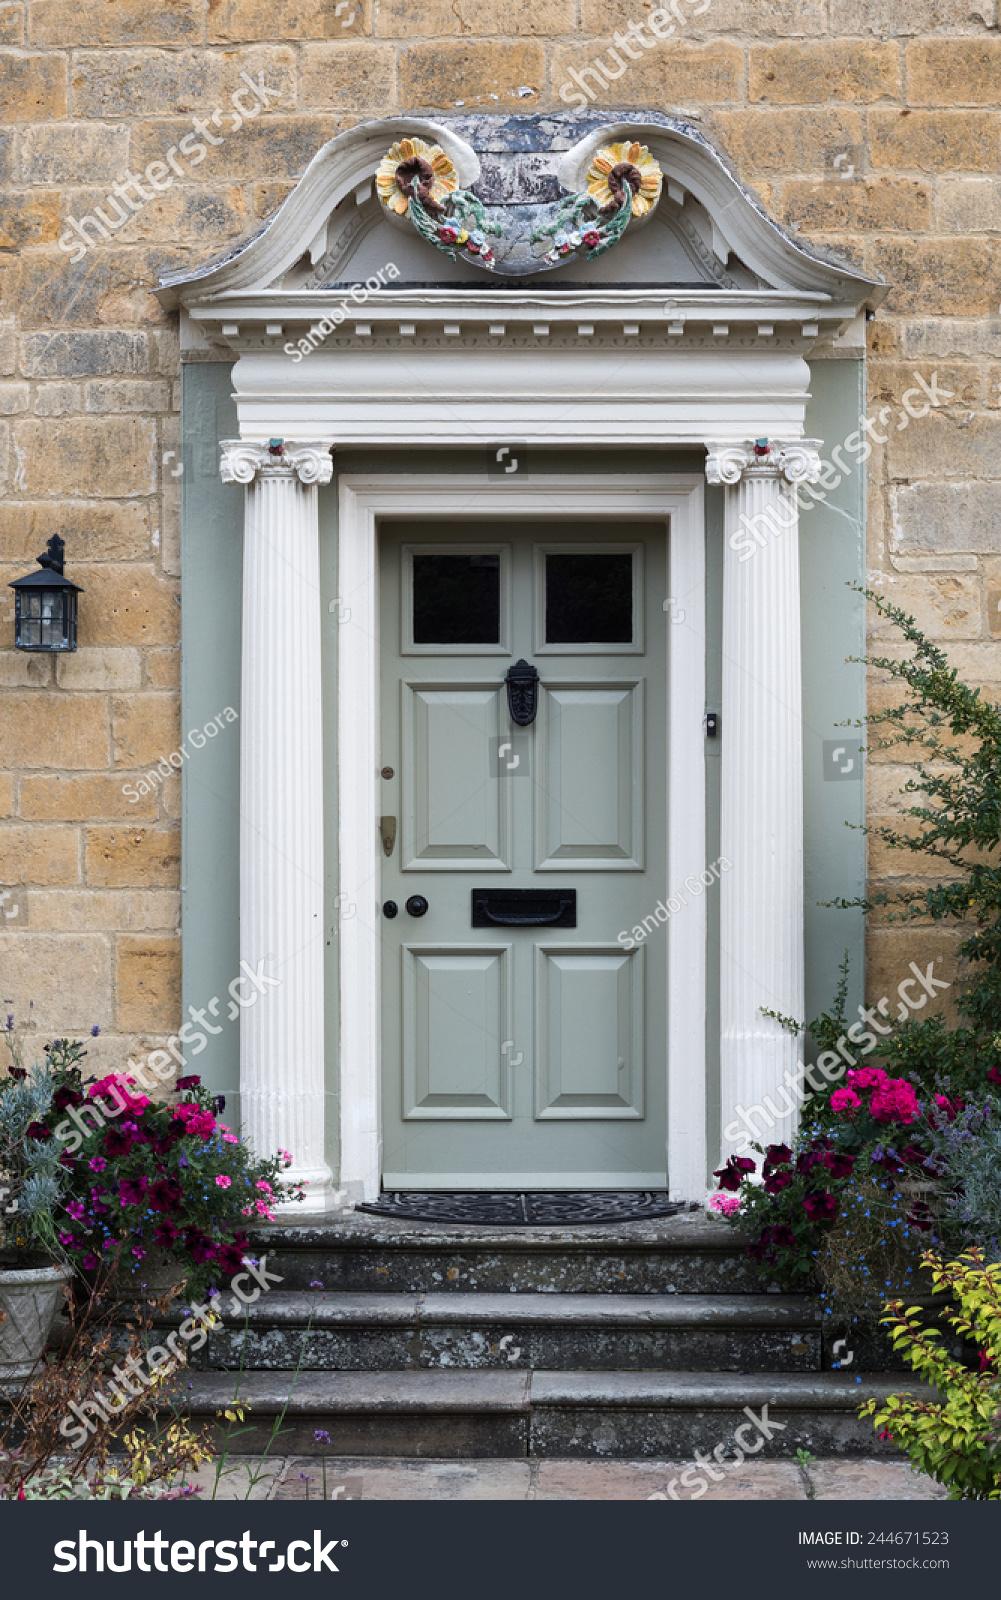 Richly Decorated Wooden Front Door Pillars Stock Photo 244671523 & Pictures on Front Door Pillars - Free Home Designs Photos Ideas Pezcame.Com